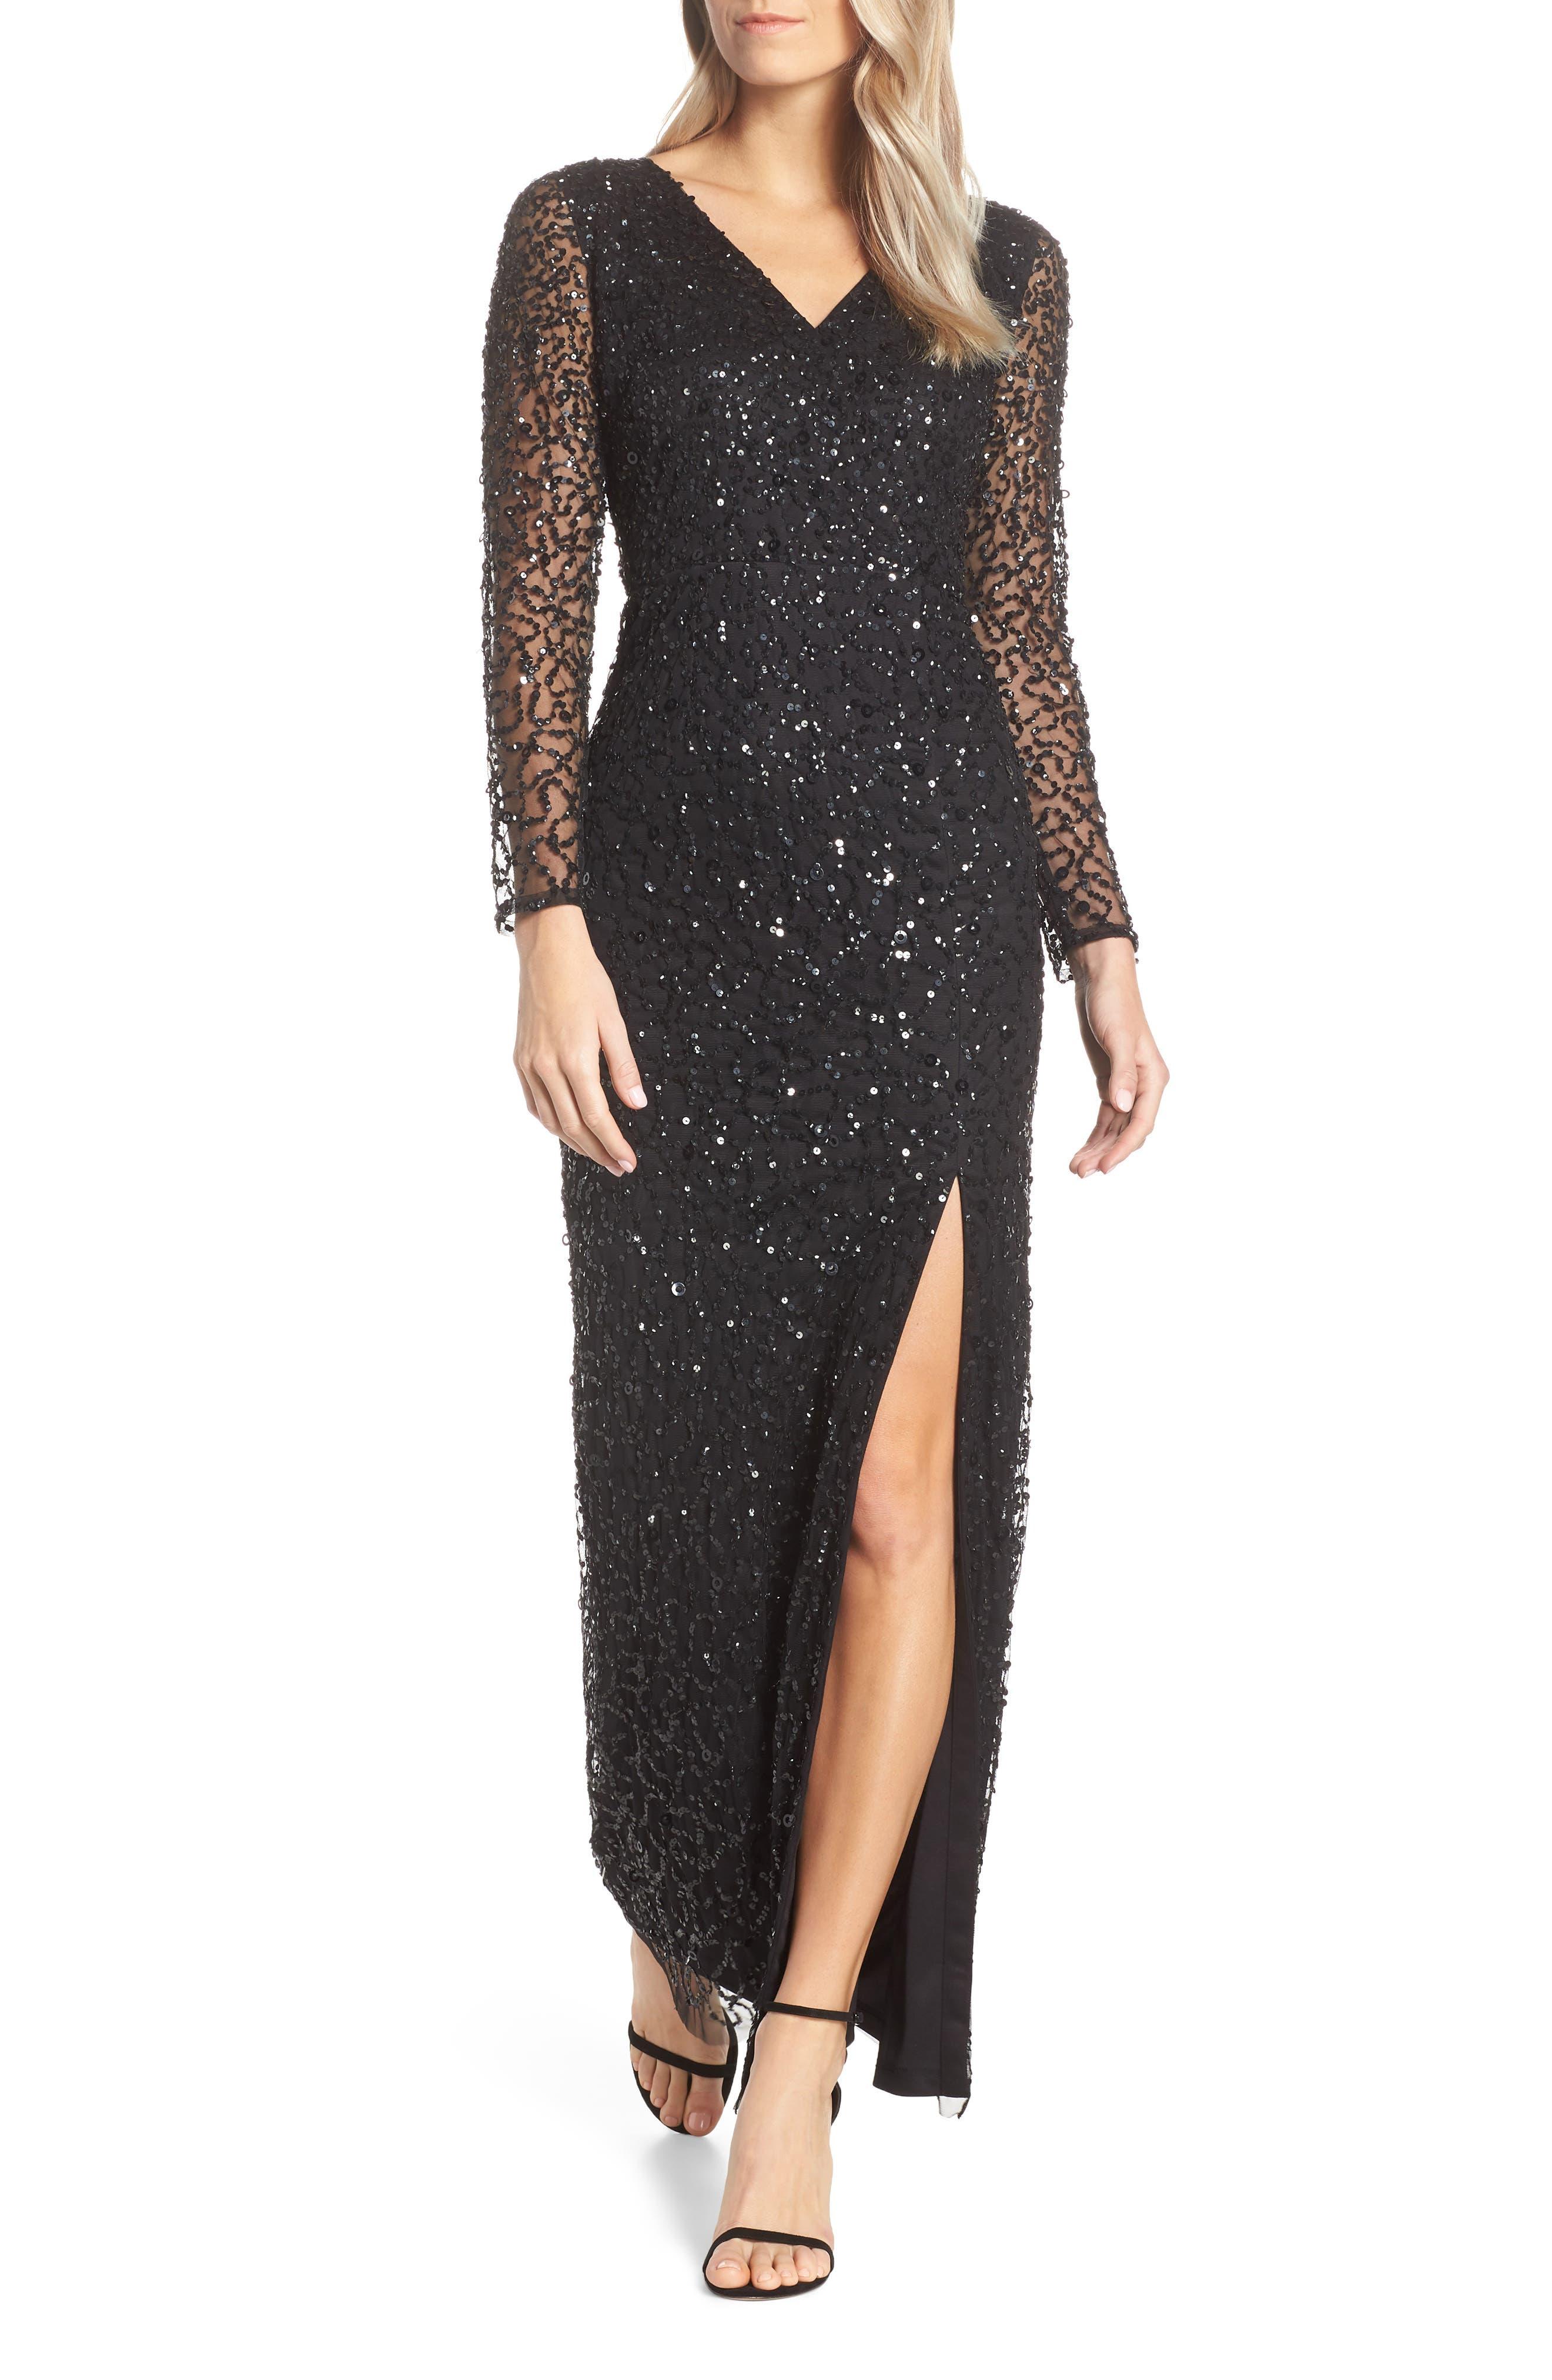 Adrianna Papell Beaded Mesh Evening Dress, Black